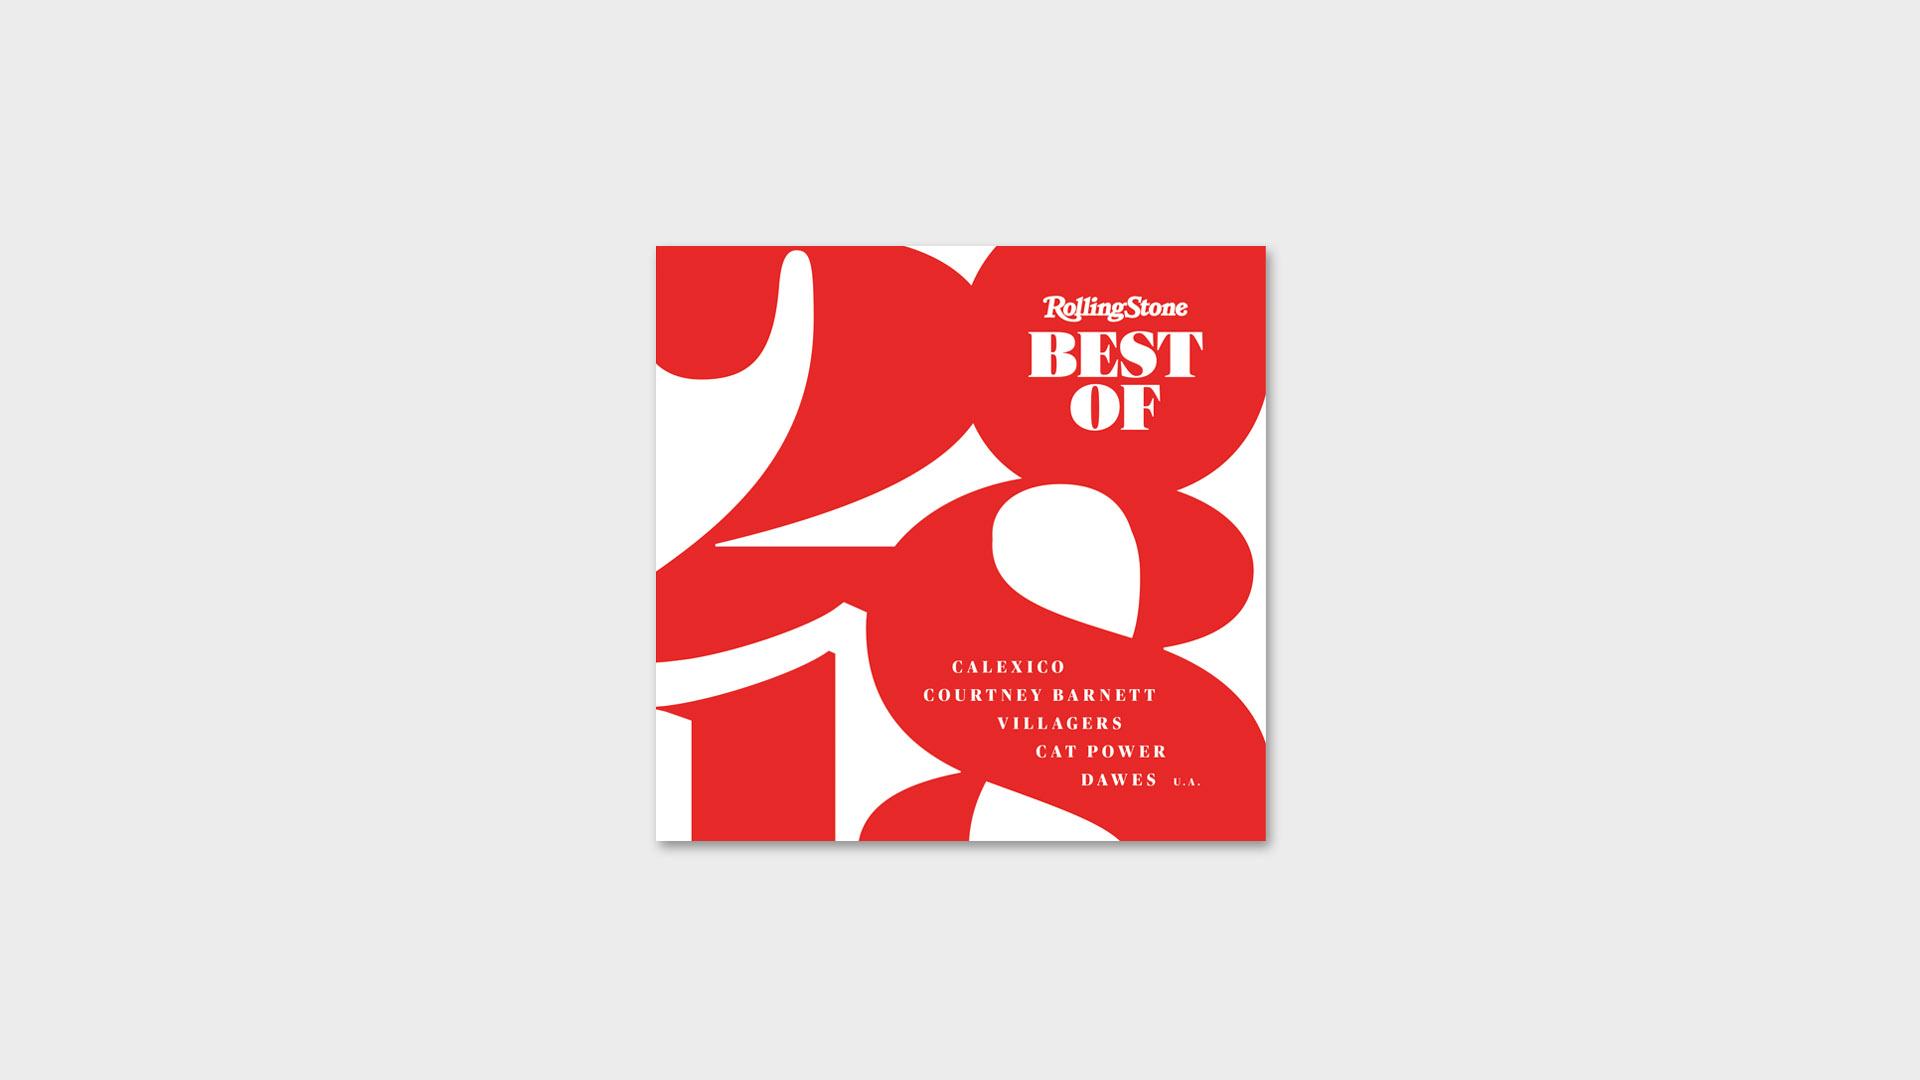 im neuen rolling stone cd best of 2018. Black Bedroom Furniture Sets. Home Design Ideas